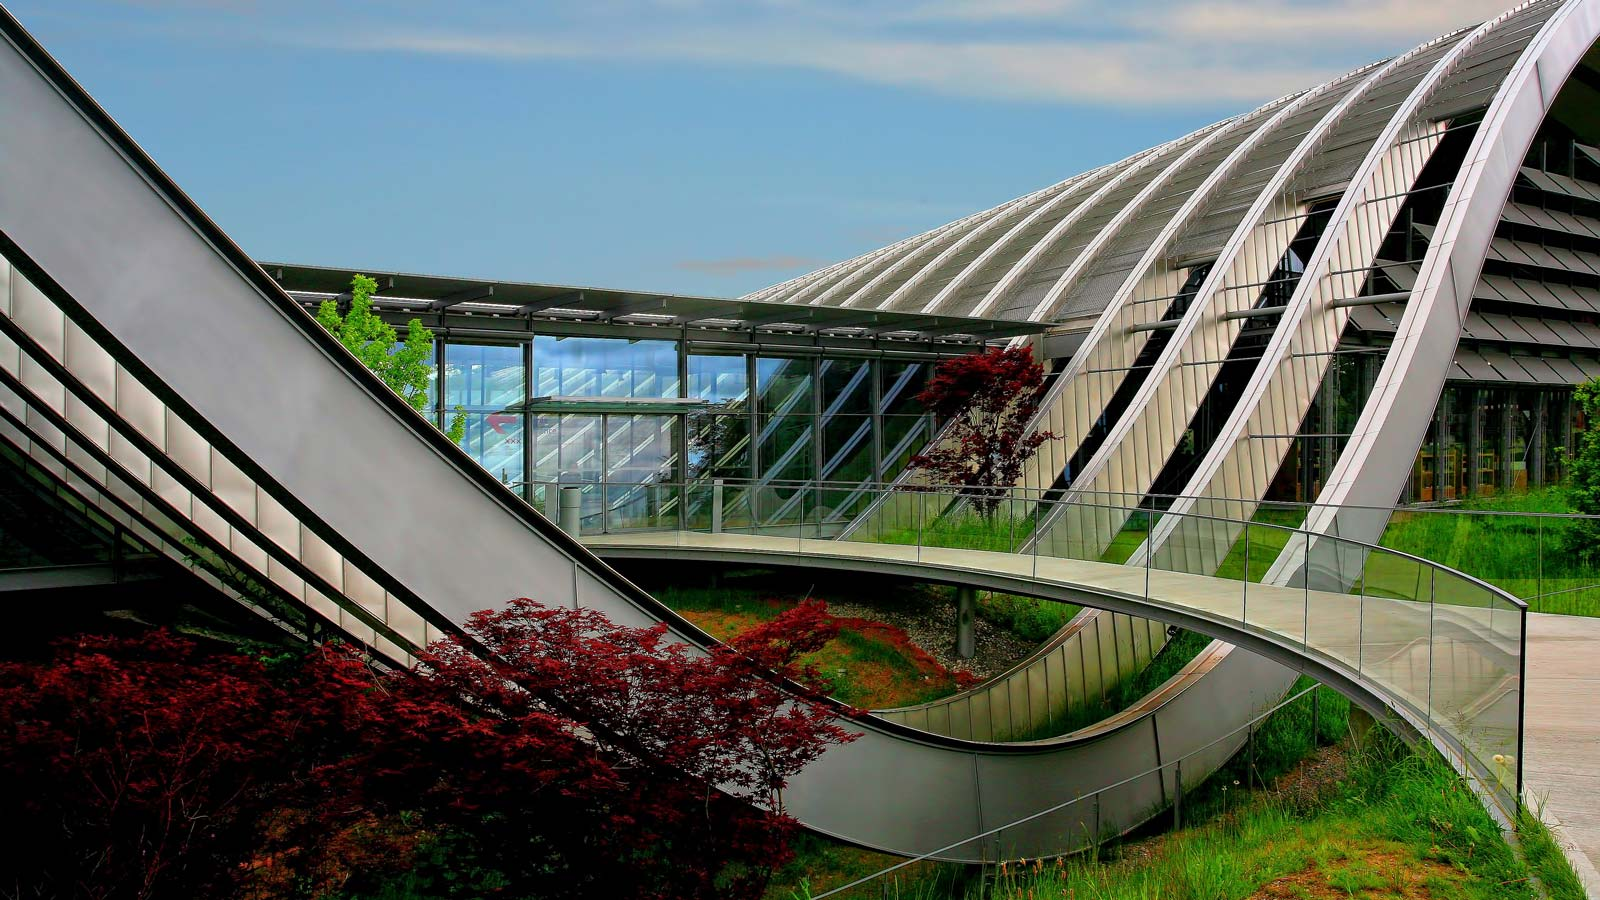 Biomimicry Design Challenge Hero Image